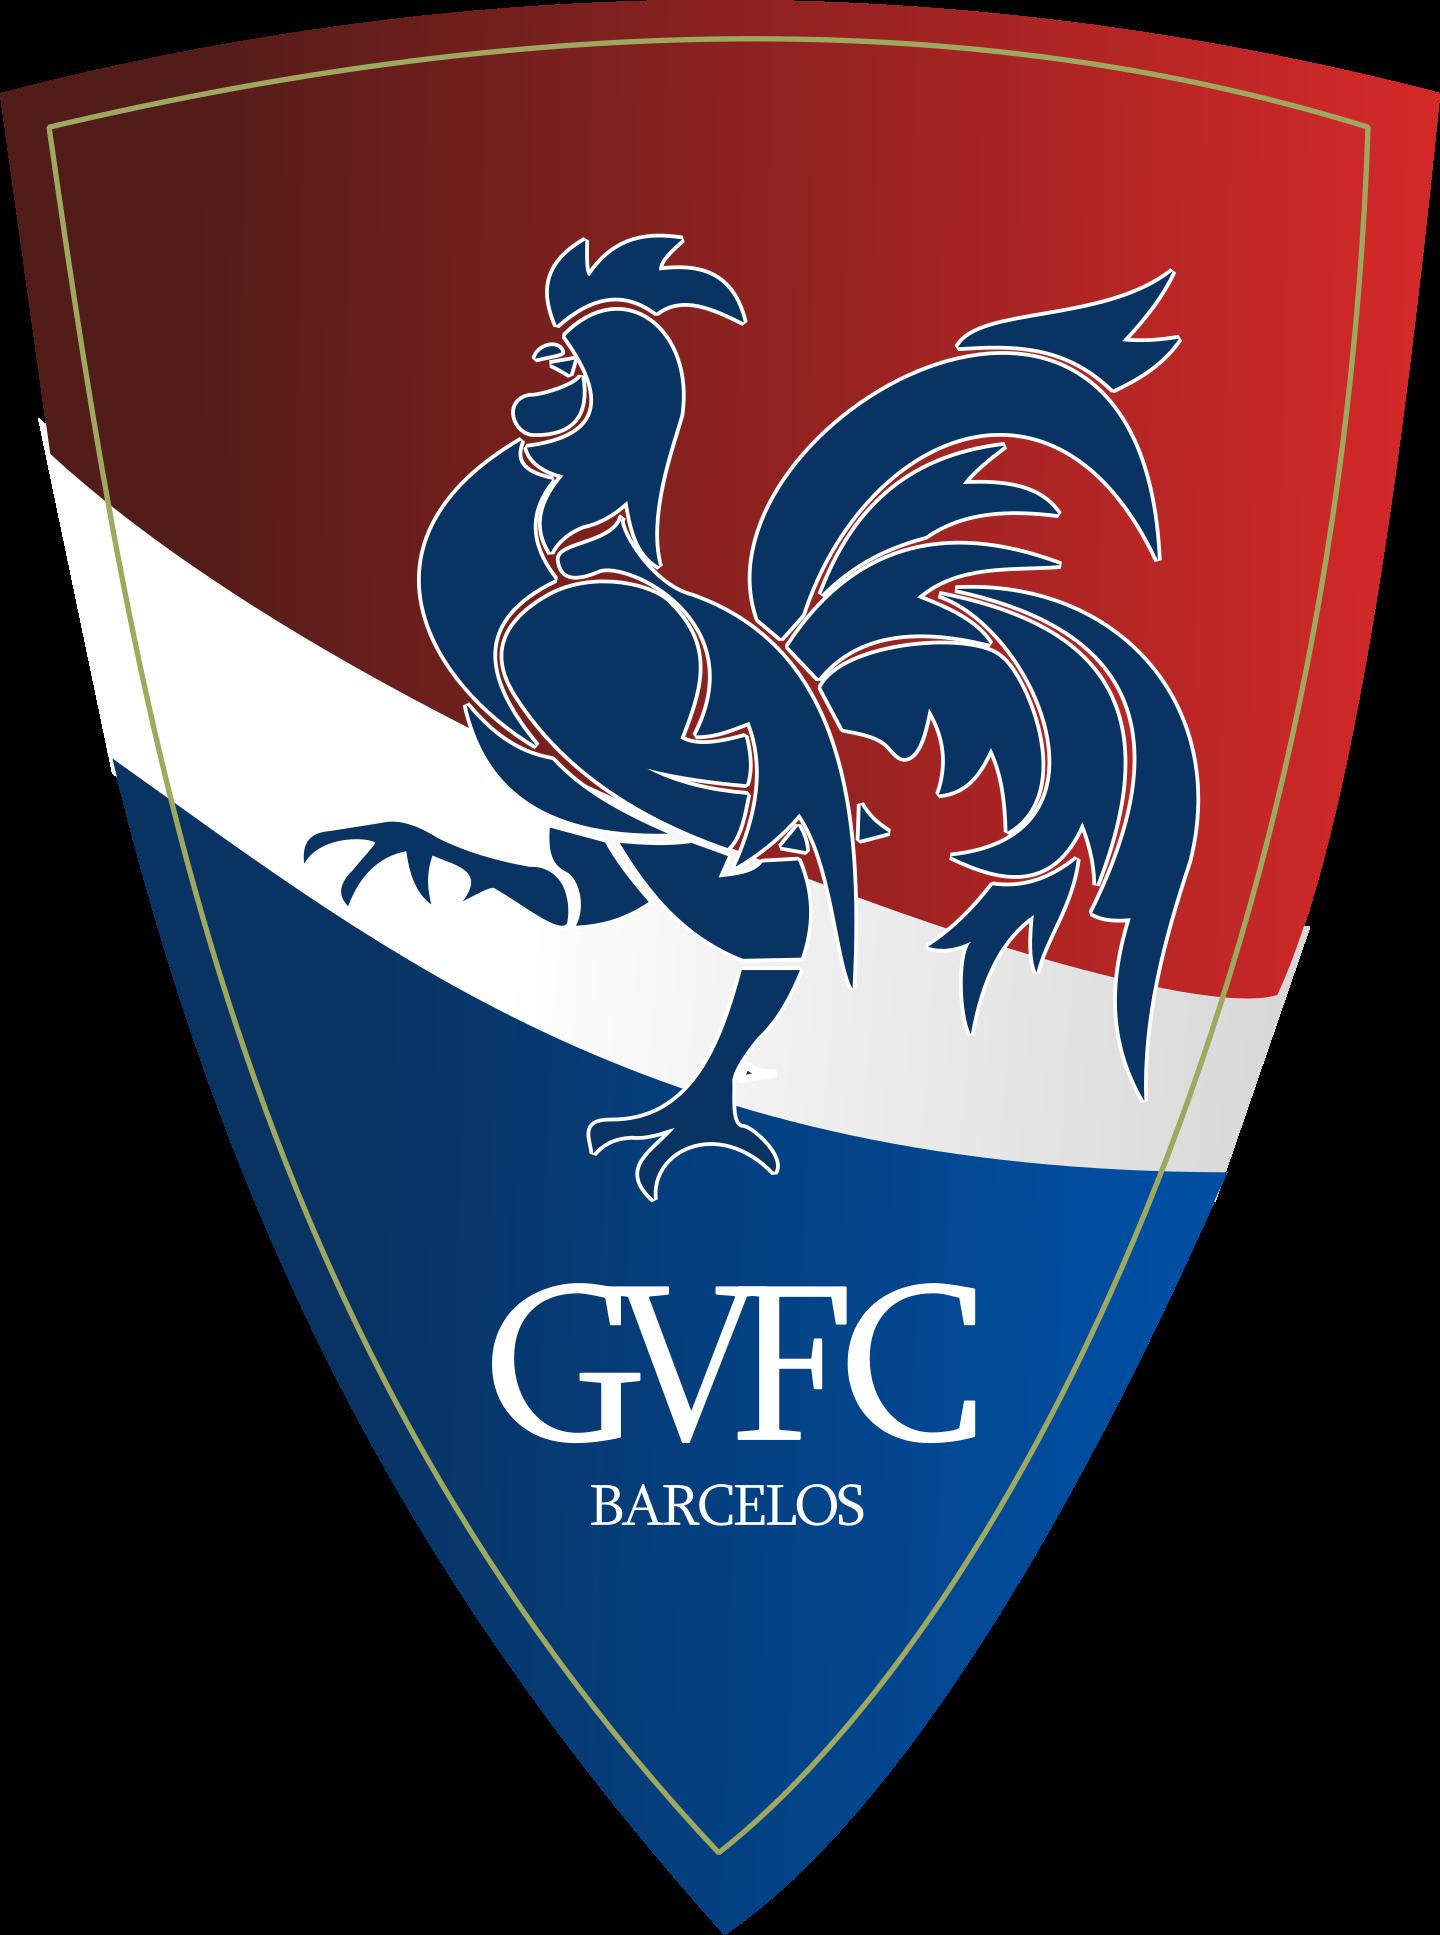 gil vicente fc logo 2 - Gil Vicente FC Logo